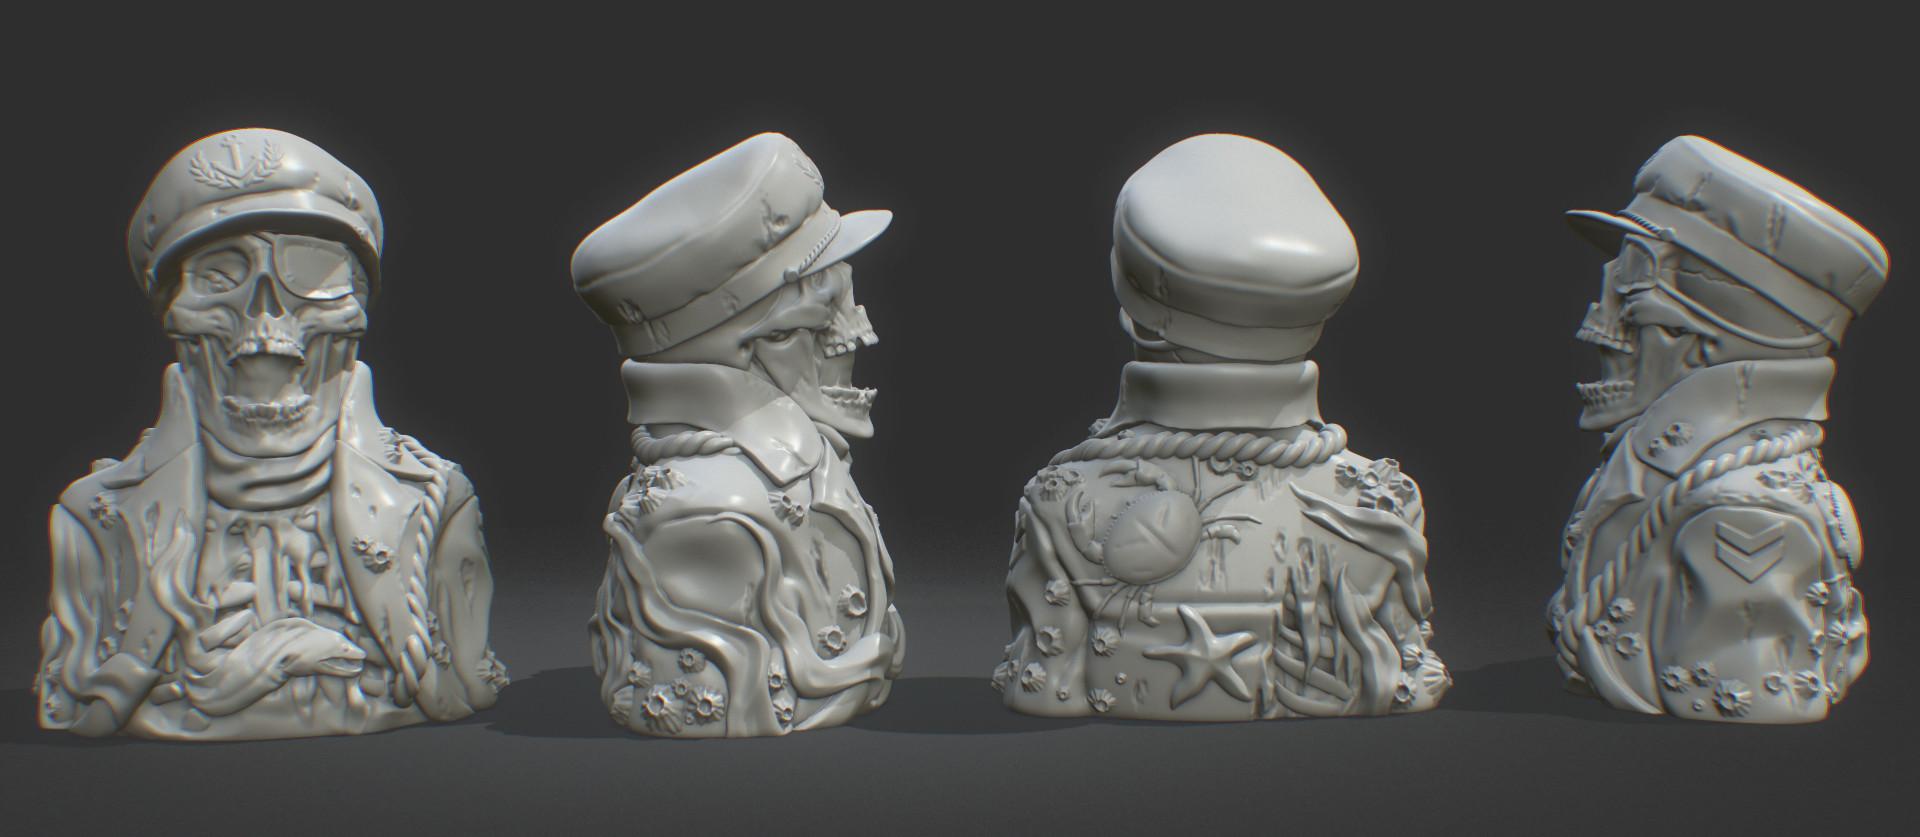 Robert fink skullcaptain finksculpt